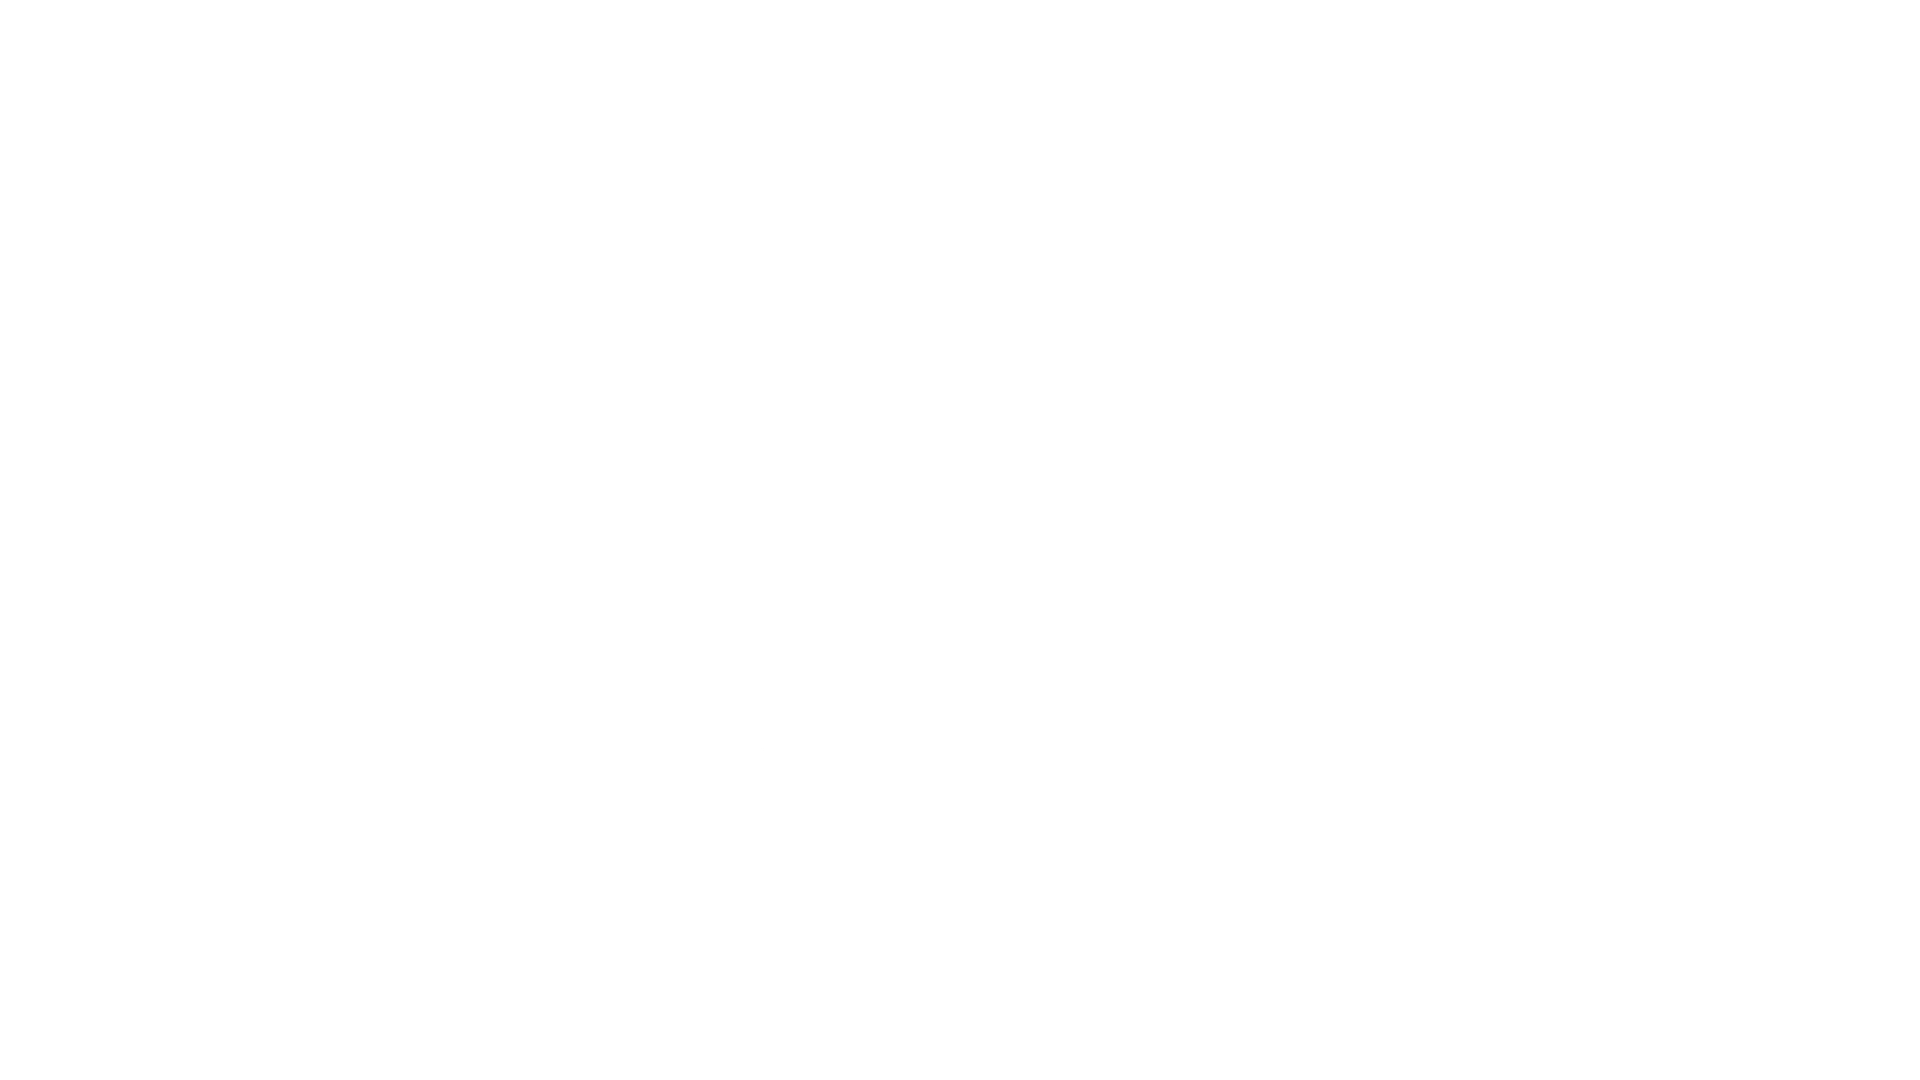 BaoHiroo-01.png